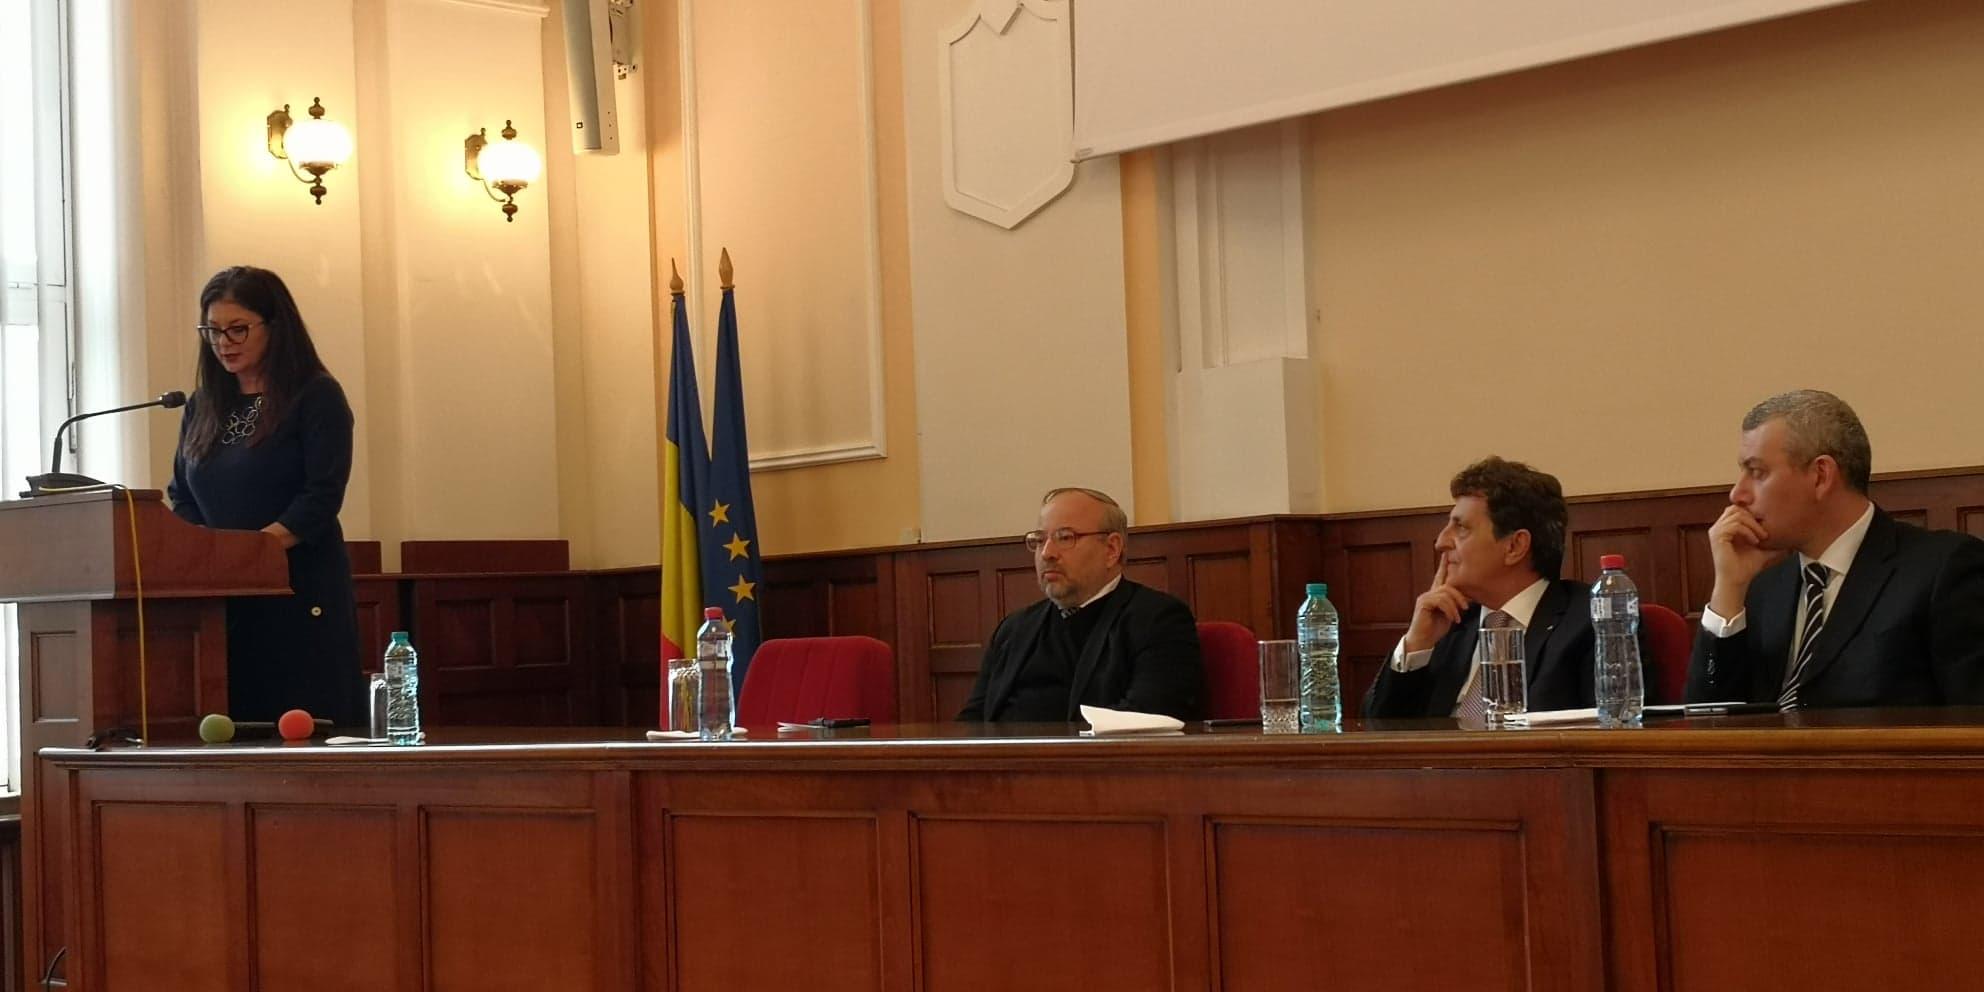 Dezbatere pe tema Constituției României, la UMFST Târgu Mureș